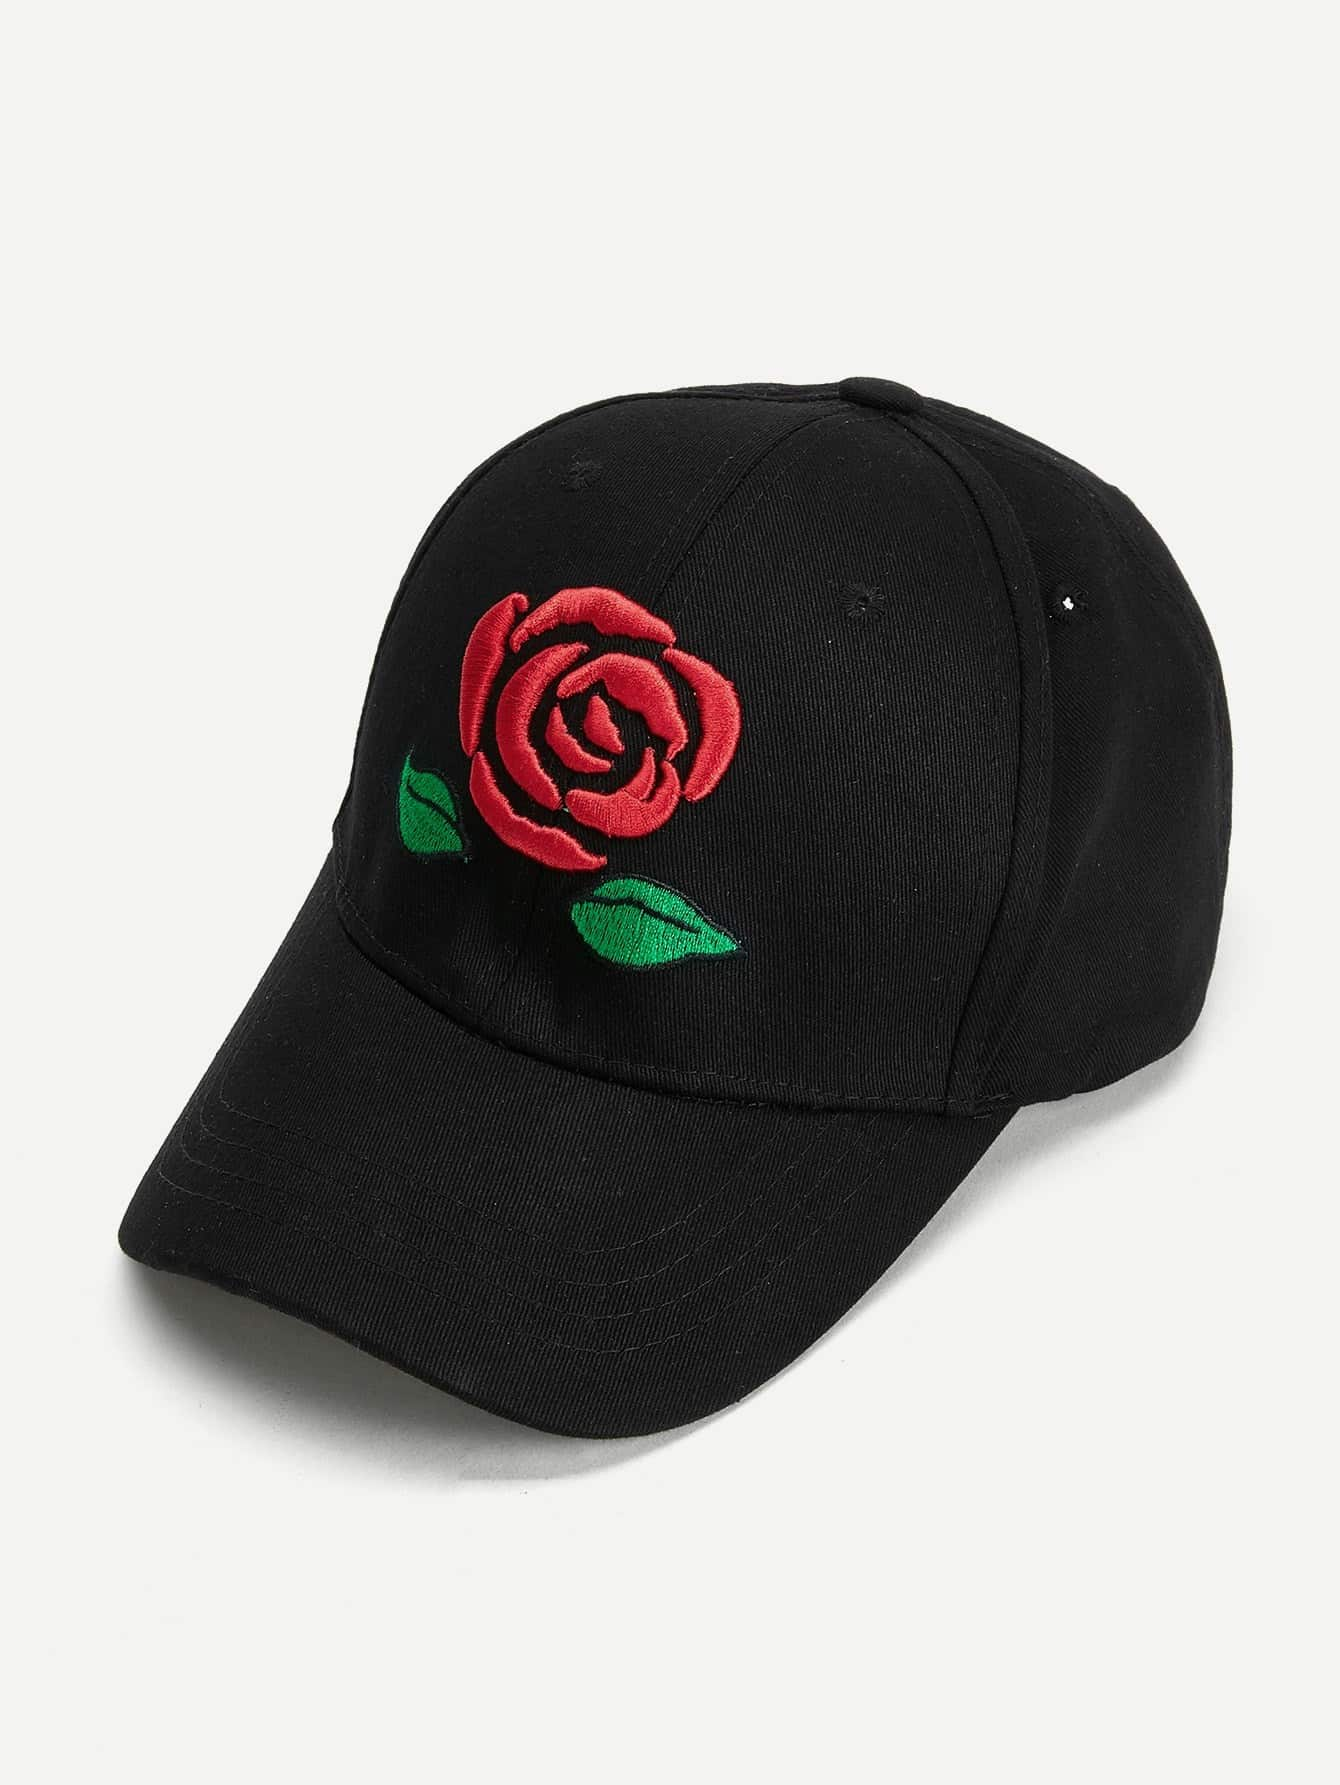 Rose Embroidered Baseball Cap